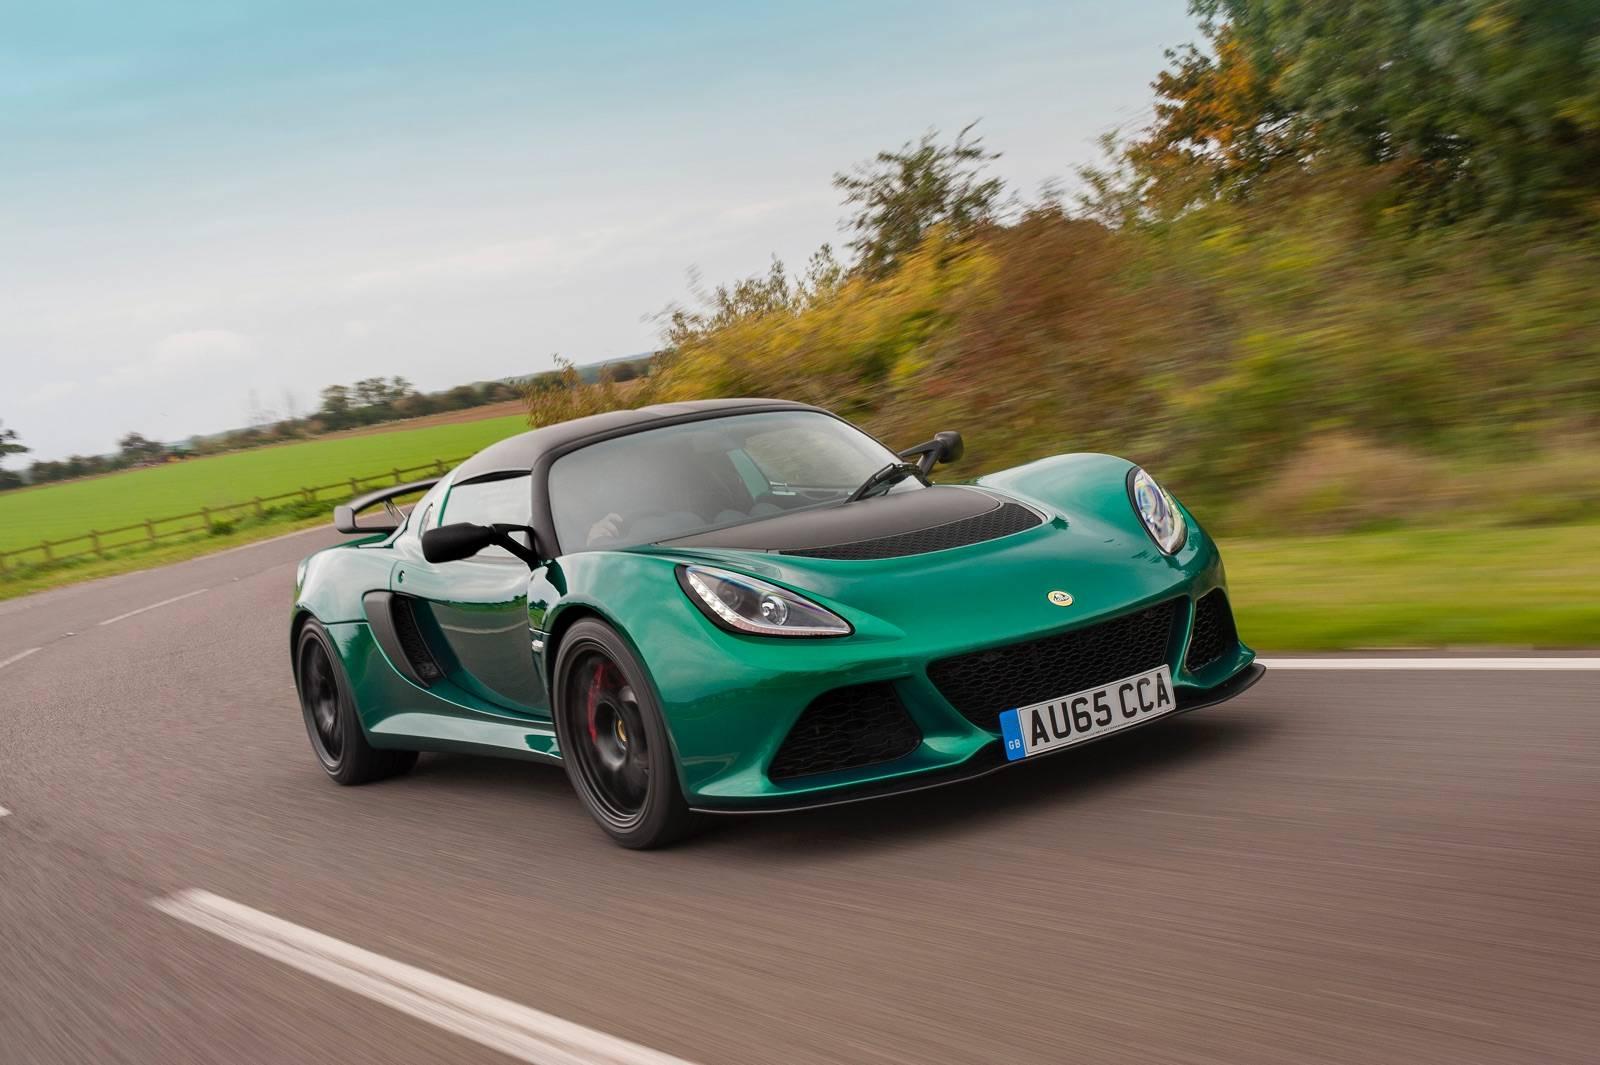 Green Lotus Exige Sport 350